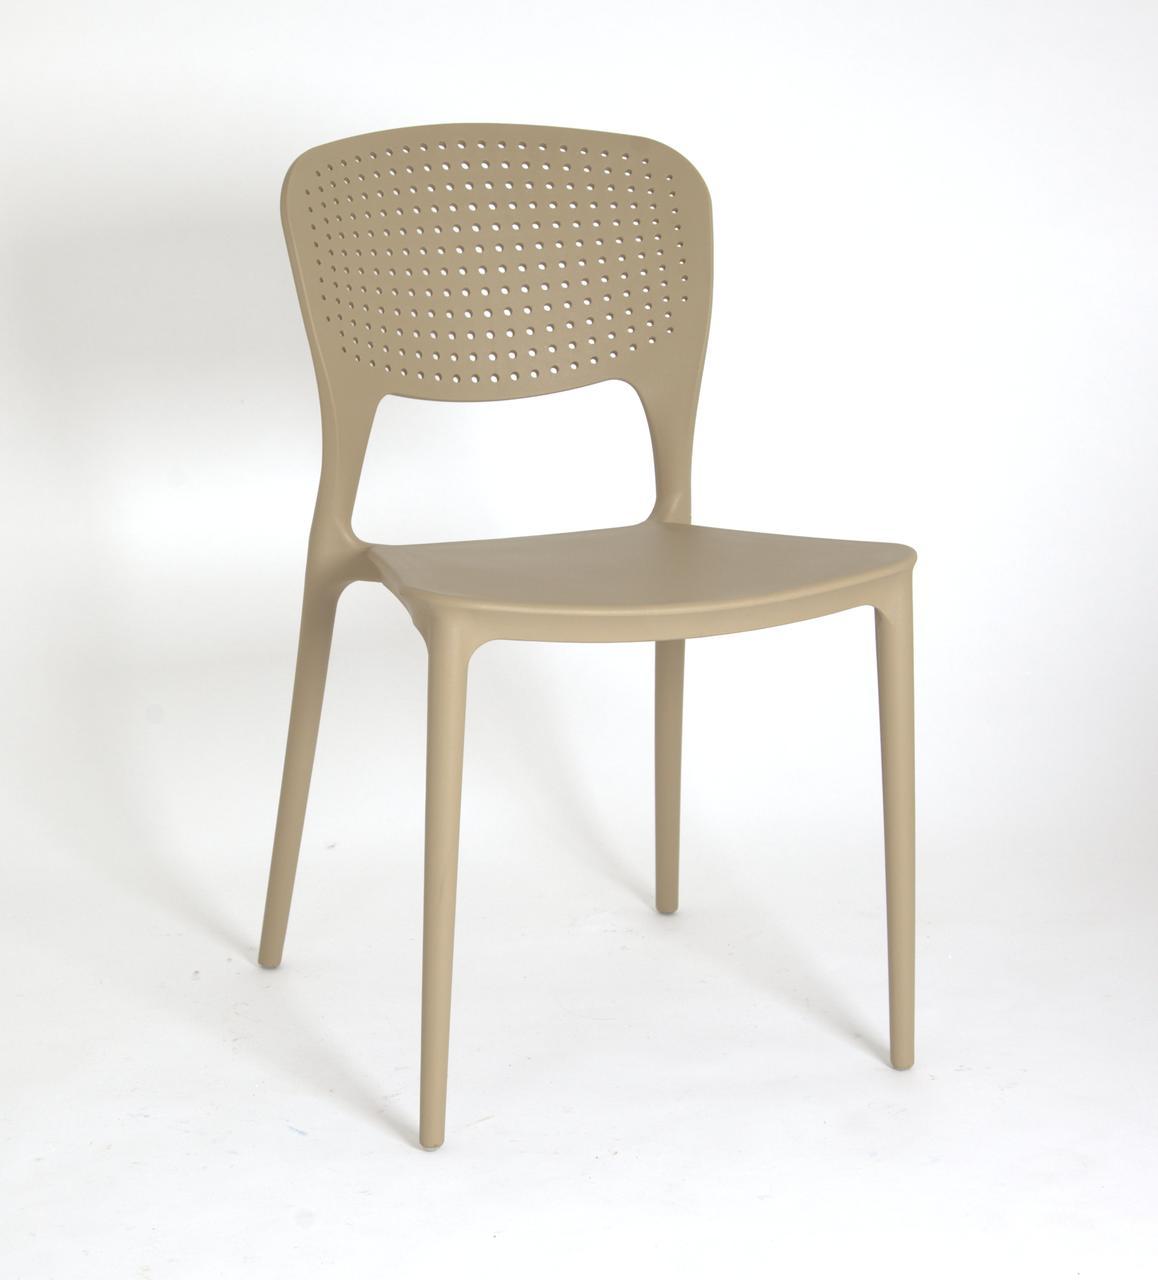 Пластиковый стул модерн Mark (Марк) бежевый 06 от Onder Mebli